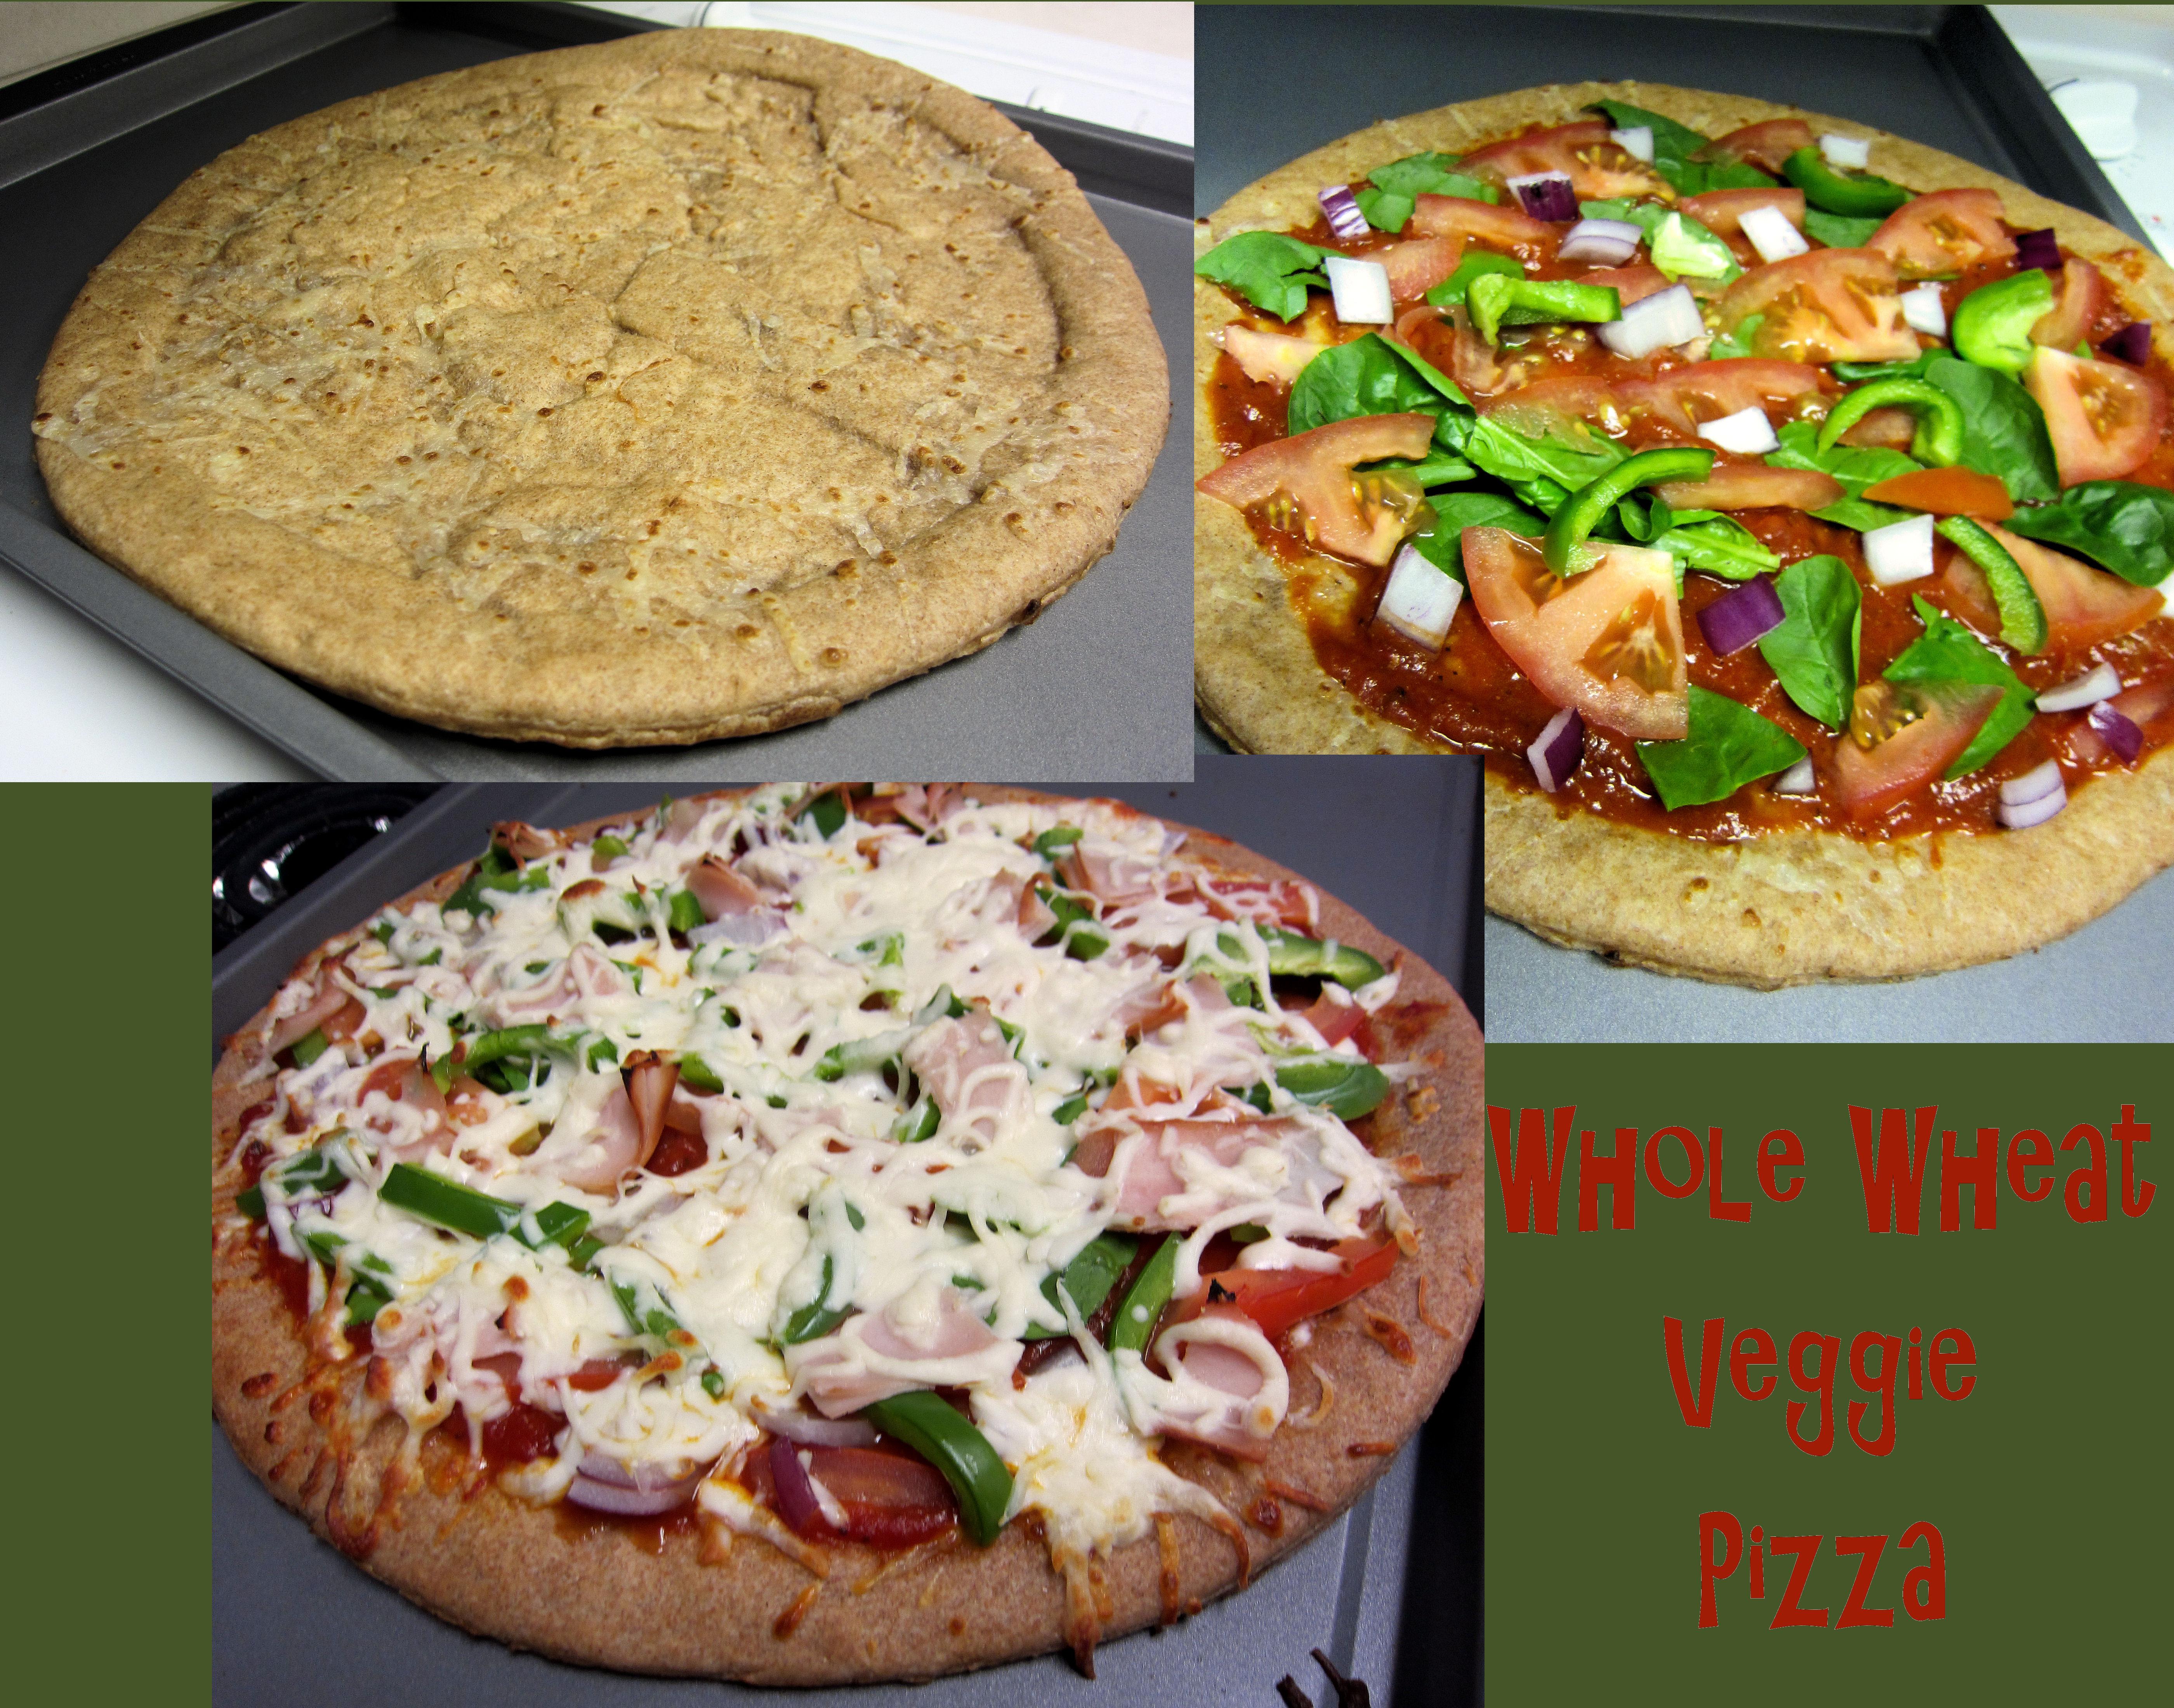 Whole Wheat Veggie Pizza | Strong Like My Coffee